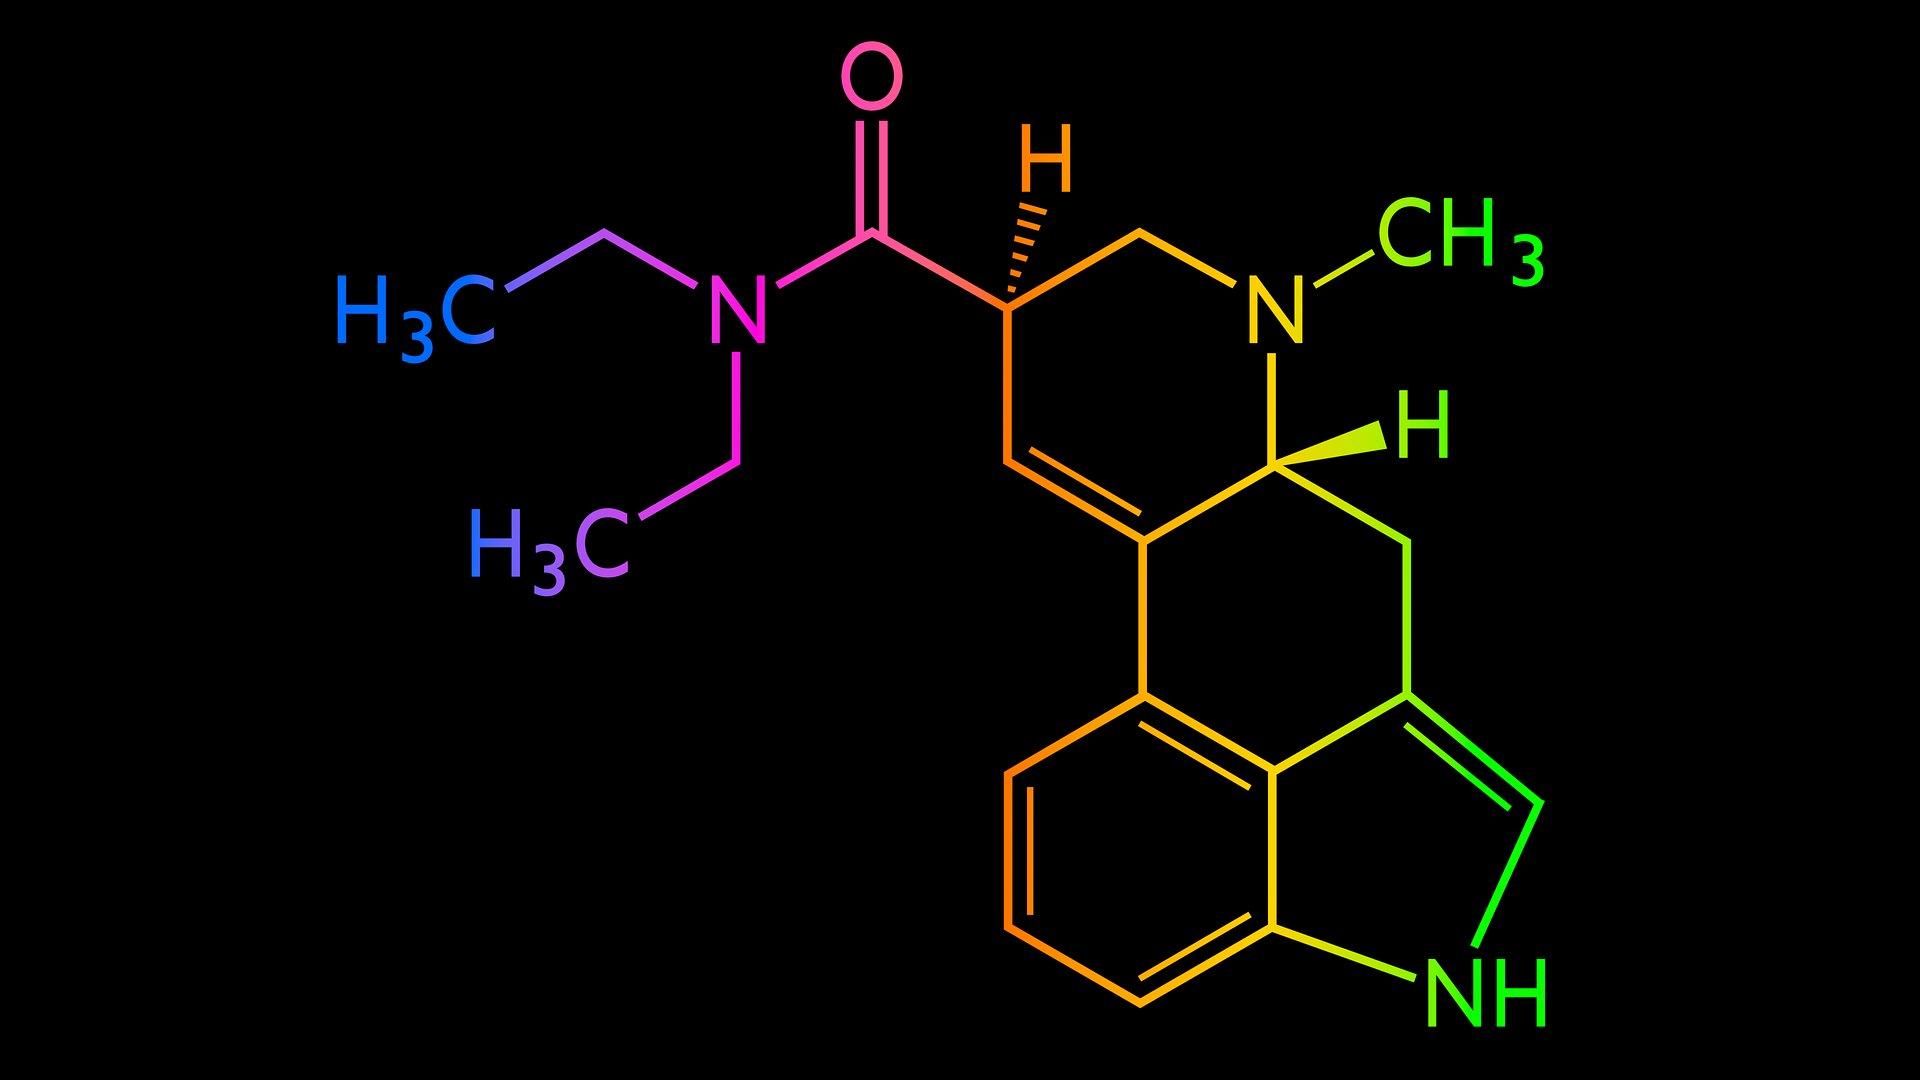 https://paddotherapie.nl/wp-content/uploads/2019/09/LSD-molecuul.jpg